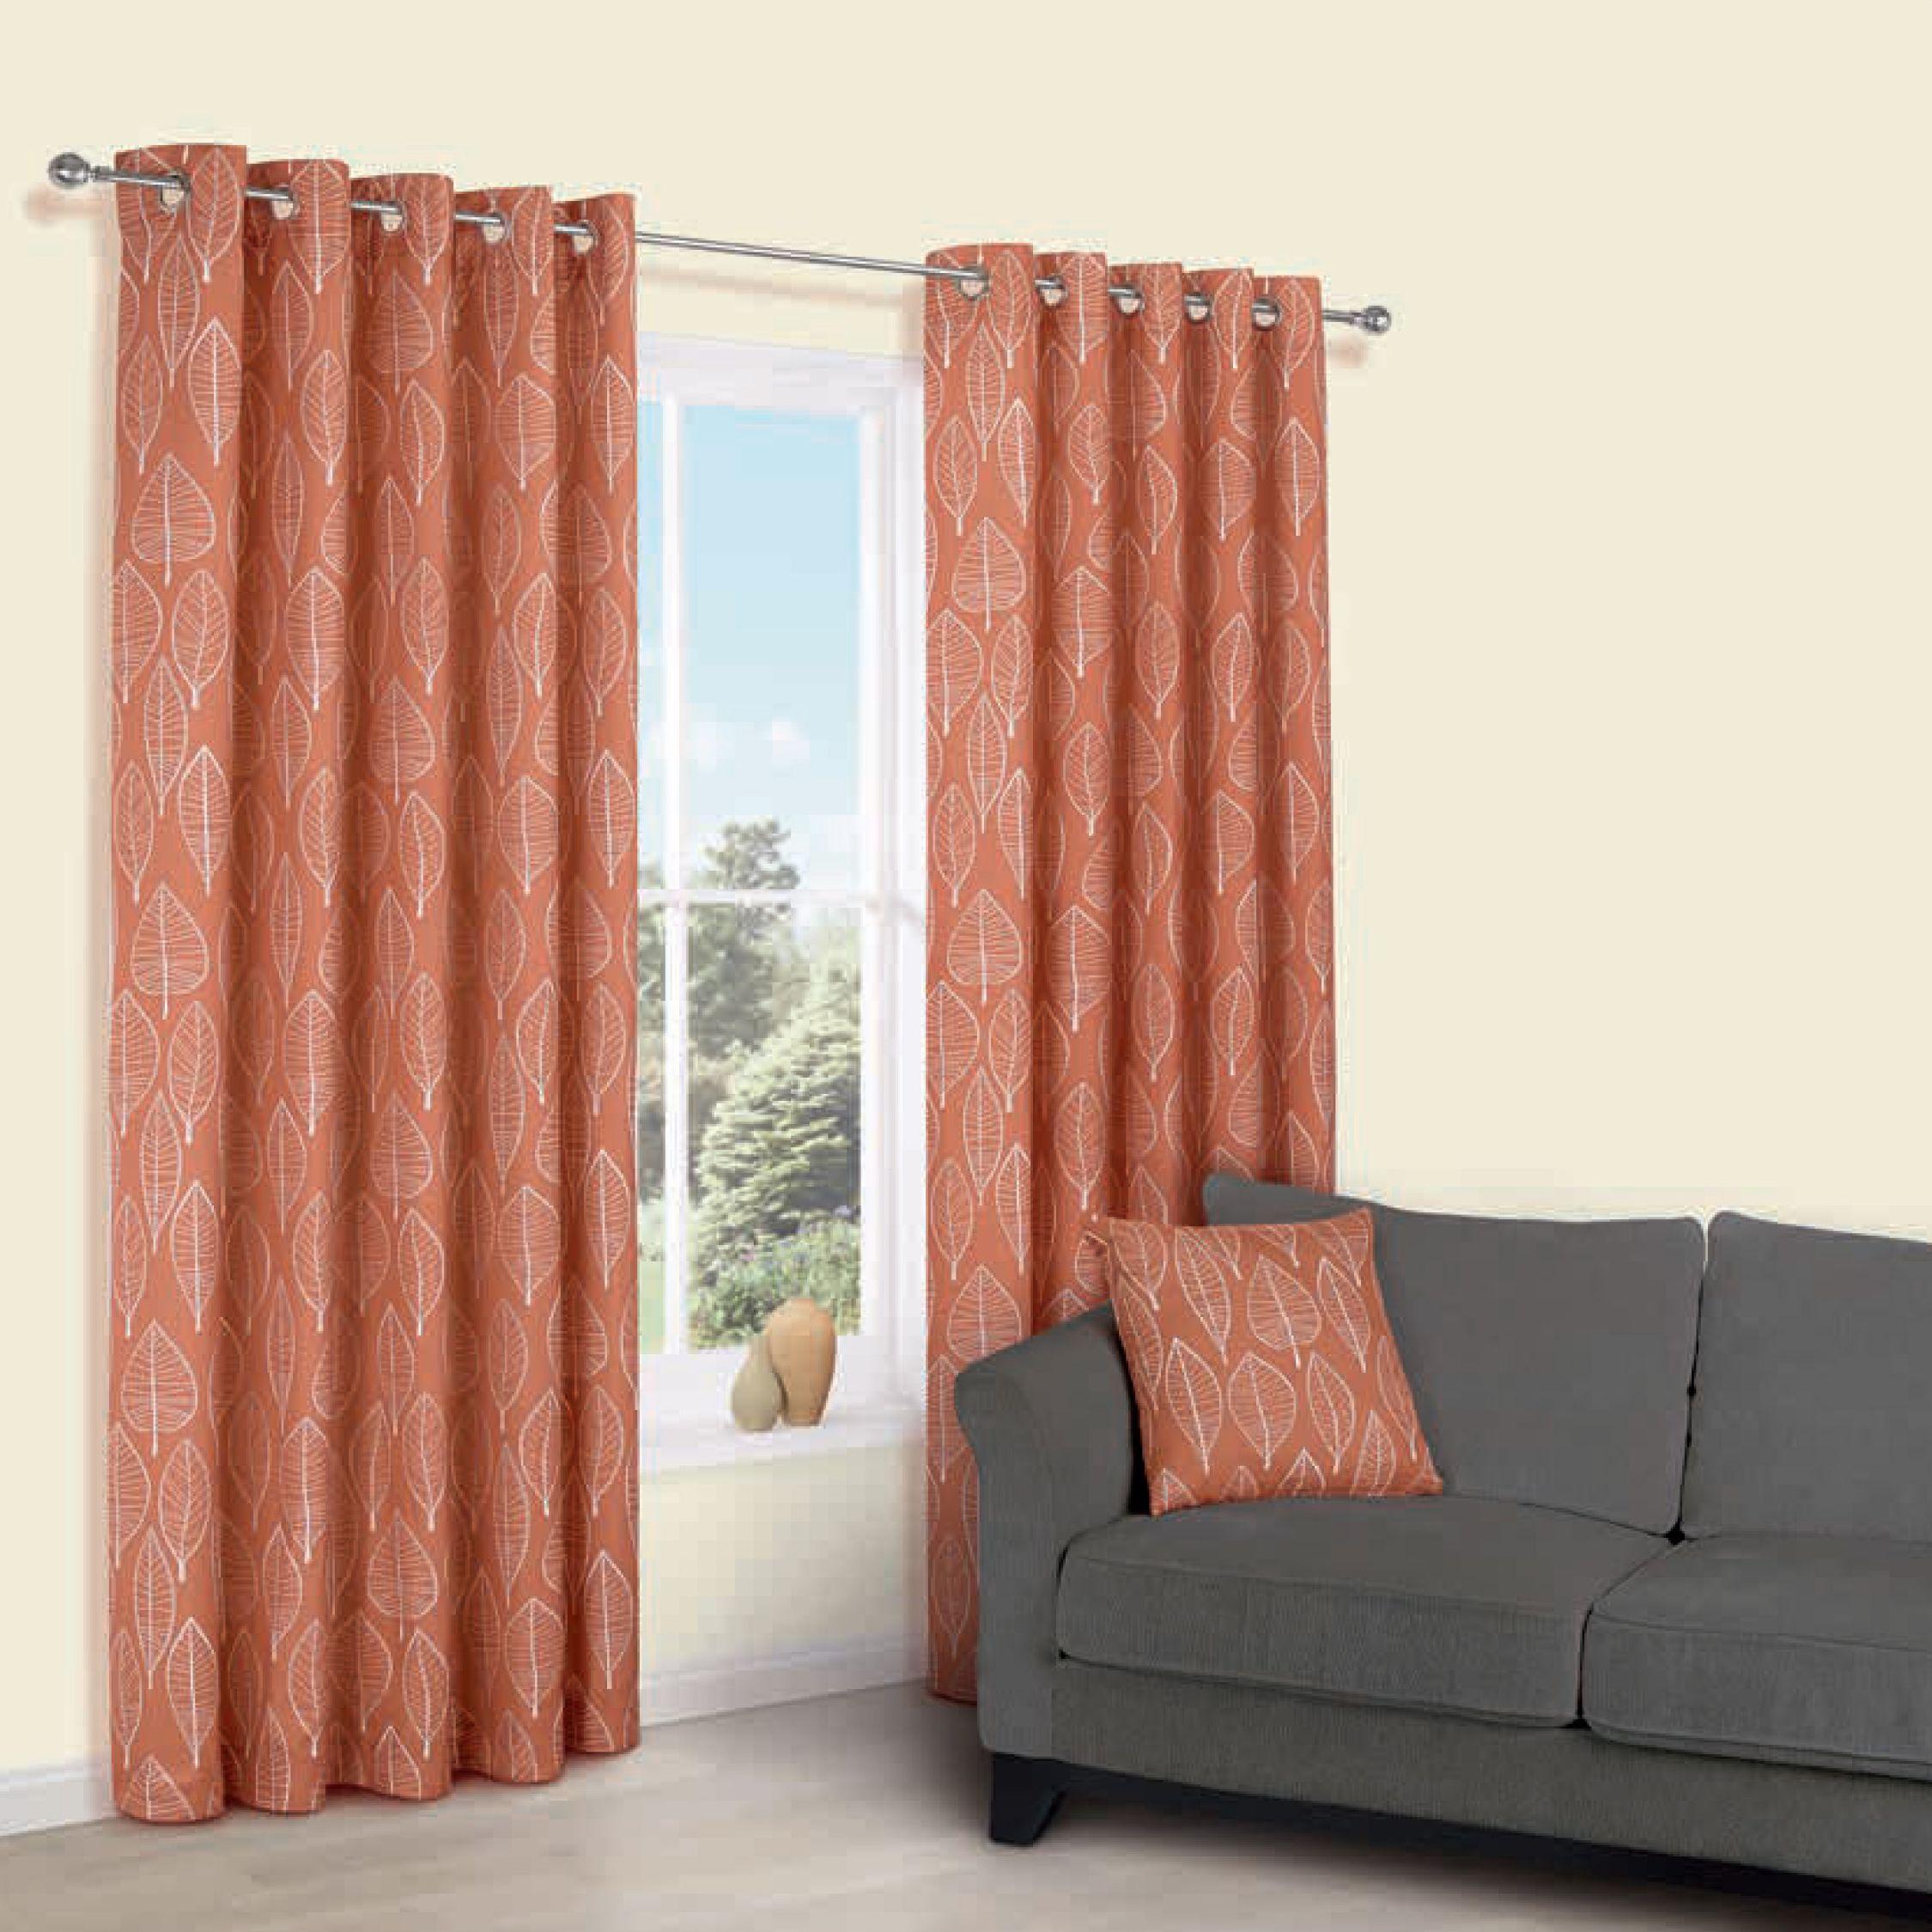 Carminda Orange Leaves Print Eyelet Lined Curtains W117 Cm L137